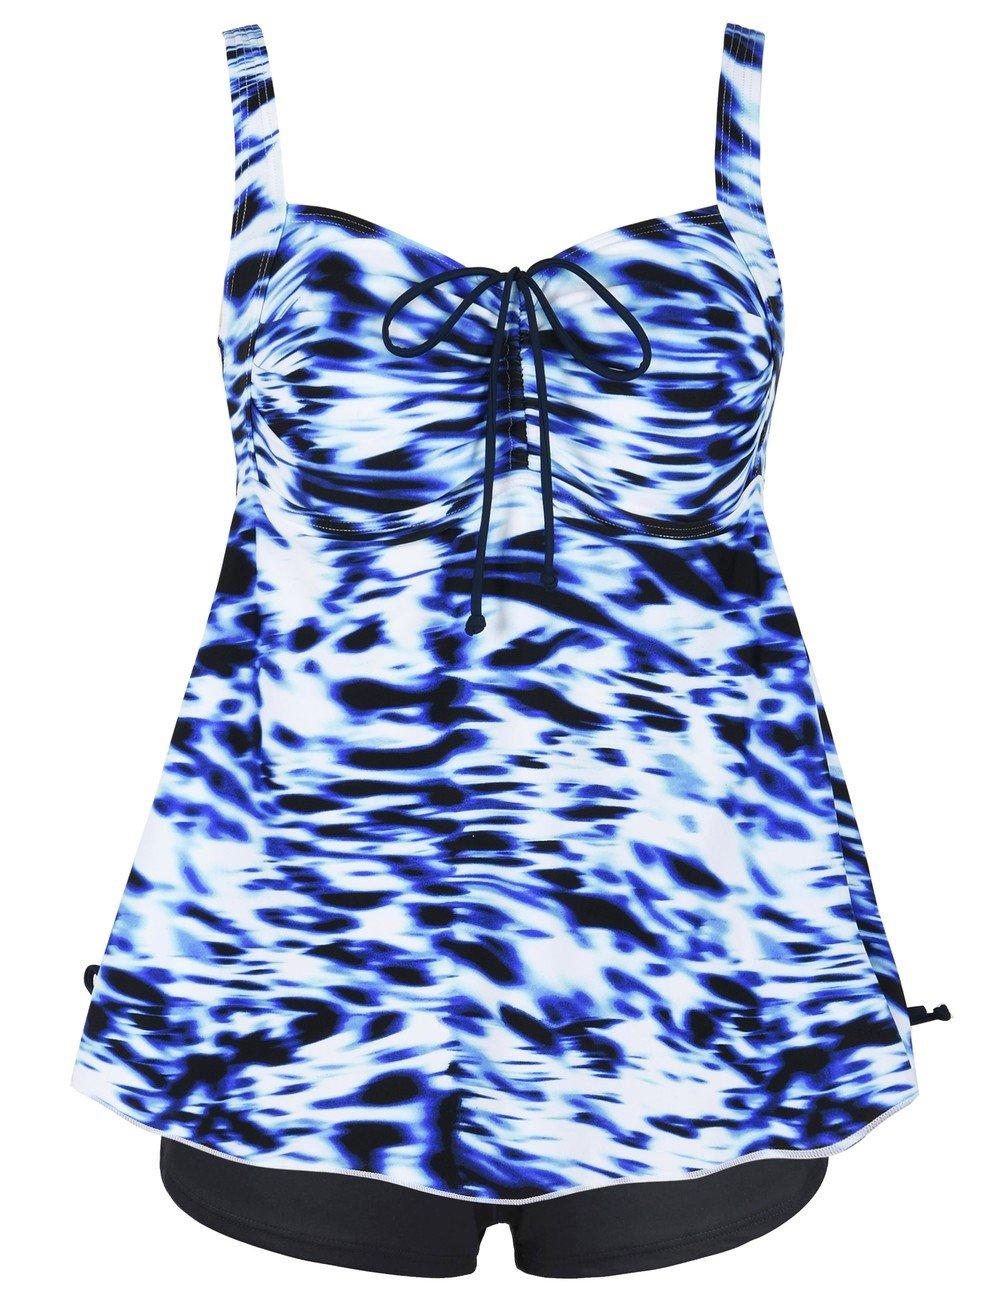 FirpearlレディースペイズリープリントPin UpプラスサイズタンキニSwimdress水着 B079Q48N61 US 26 Blue White Swirl